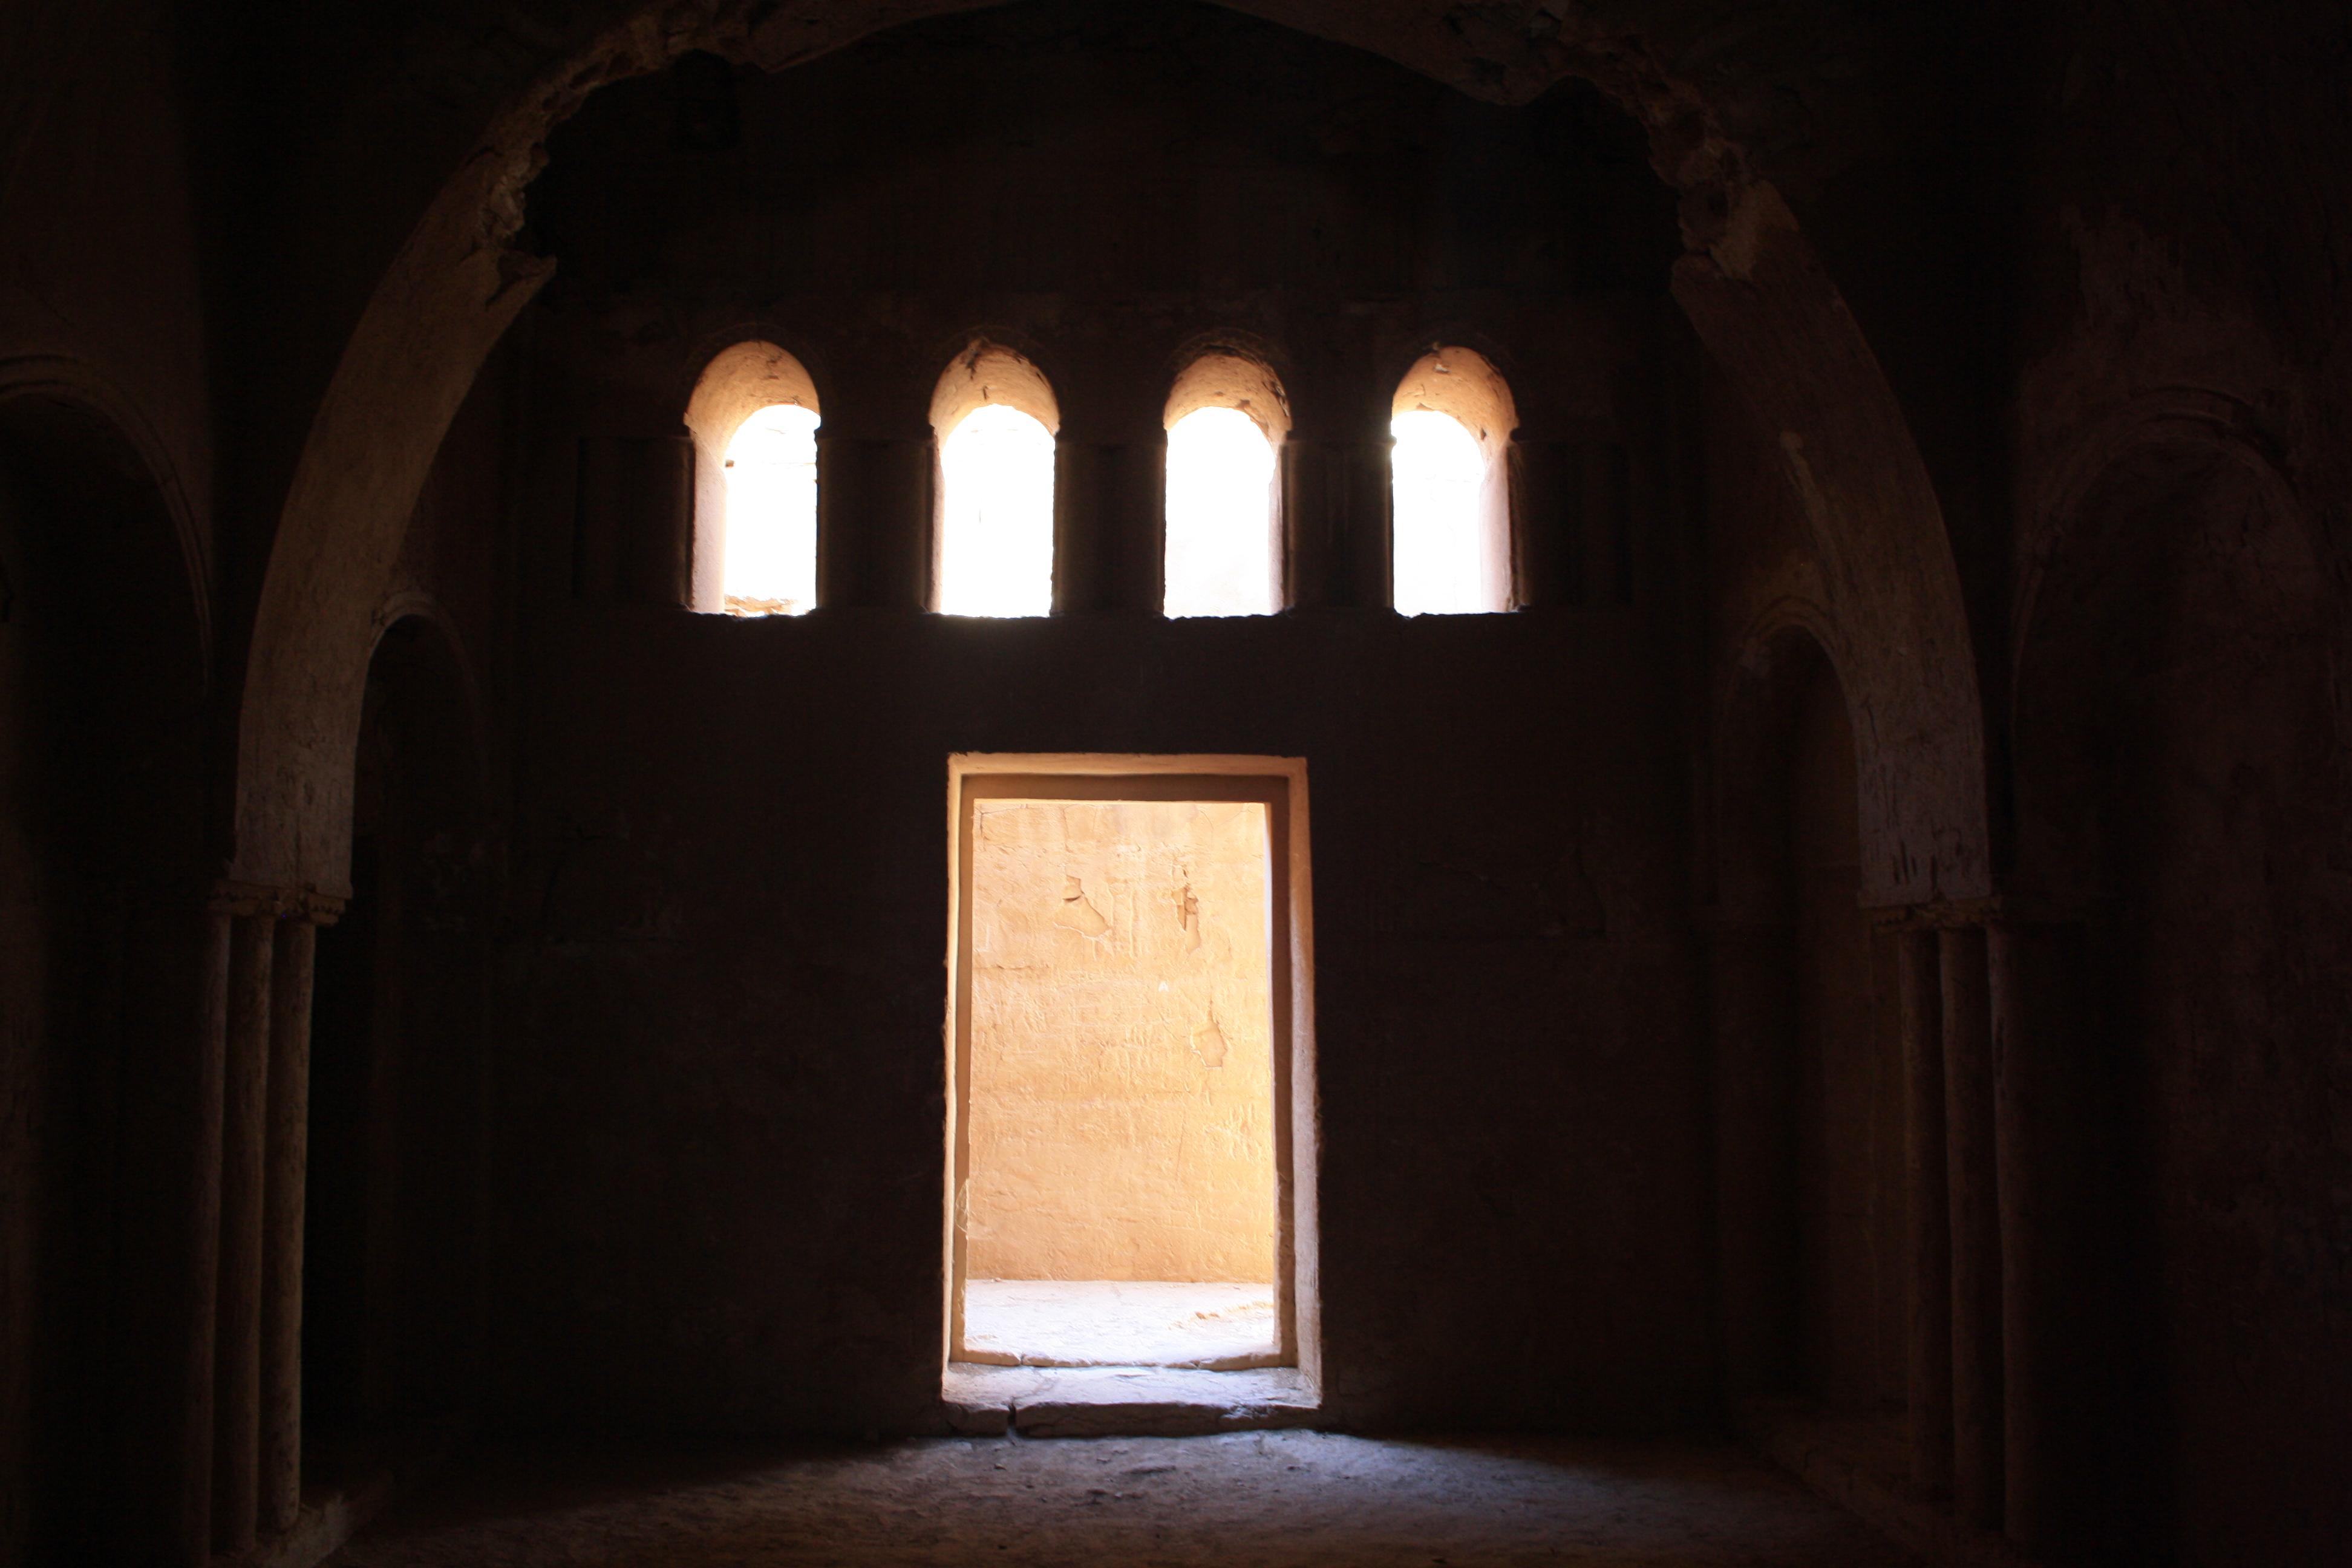 Qasr Kharana (interno), I castelli del deserto orientale